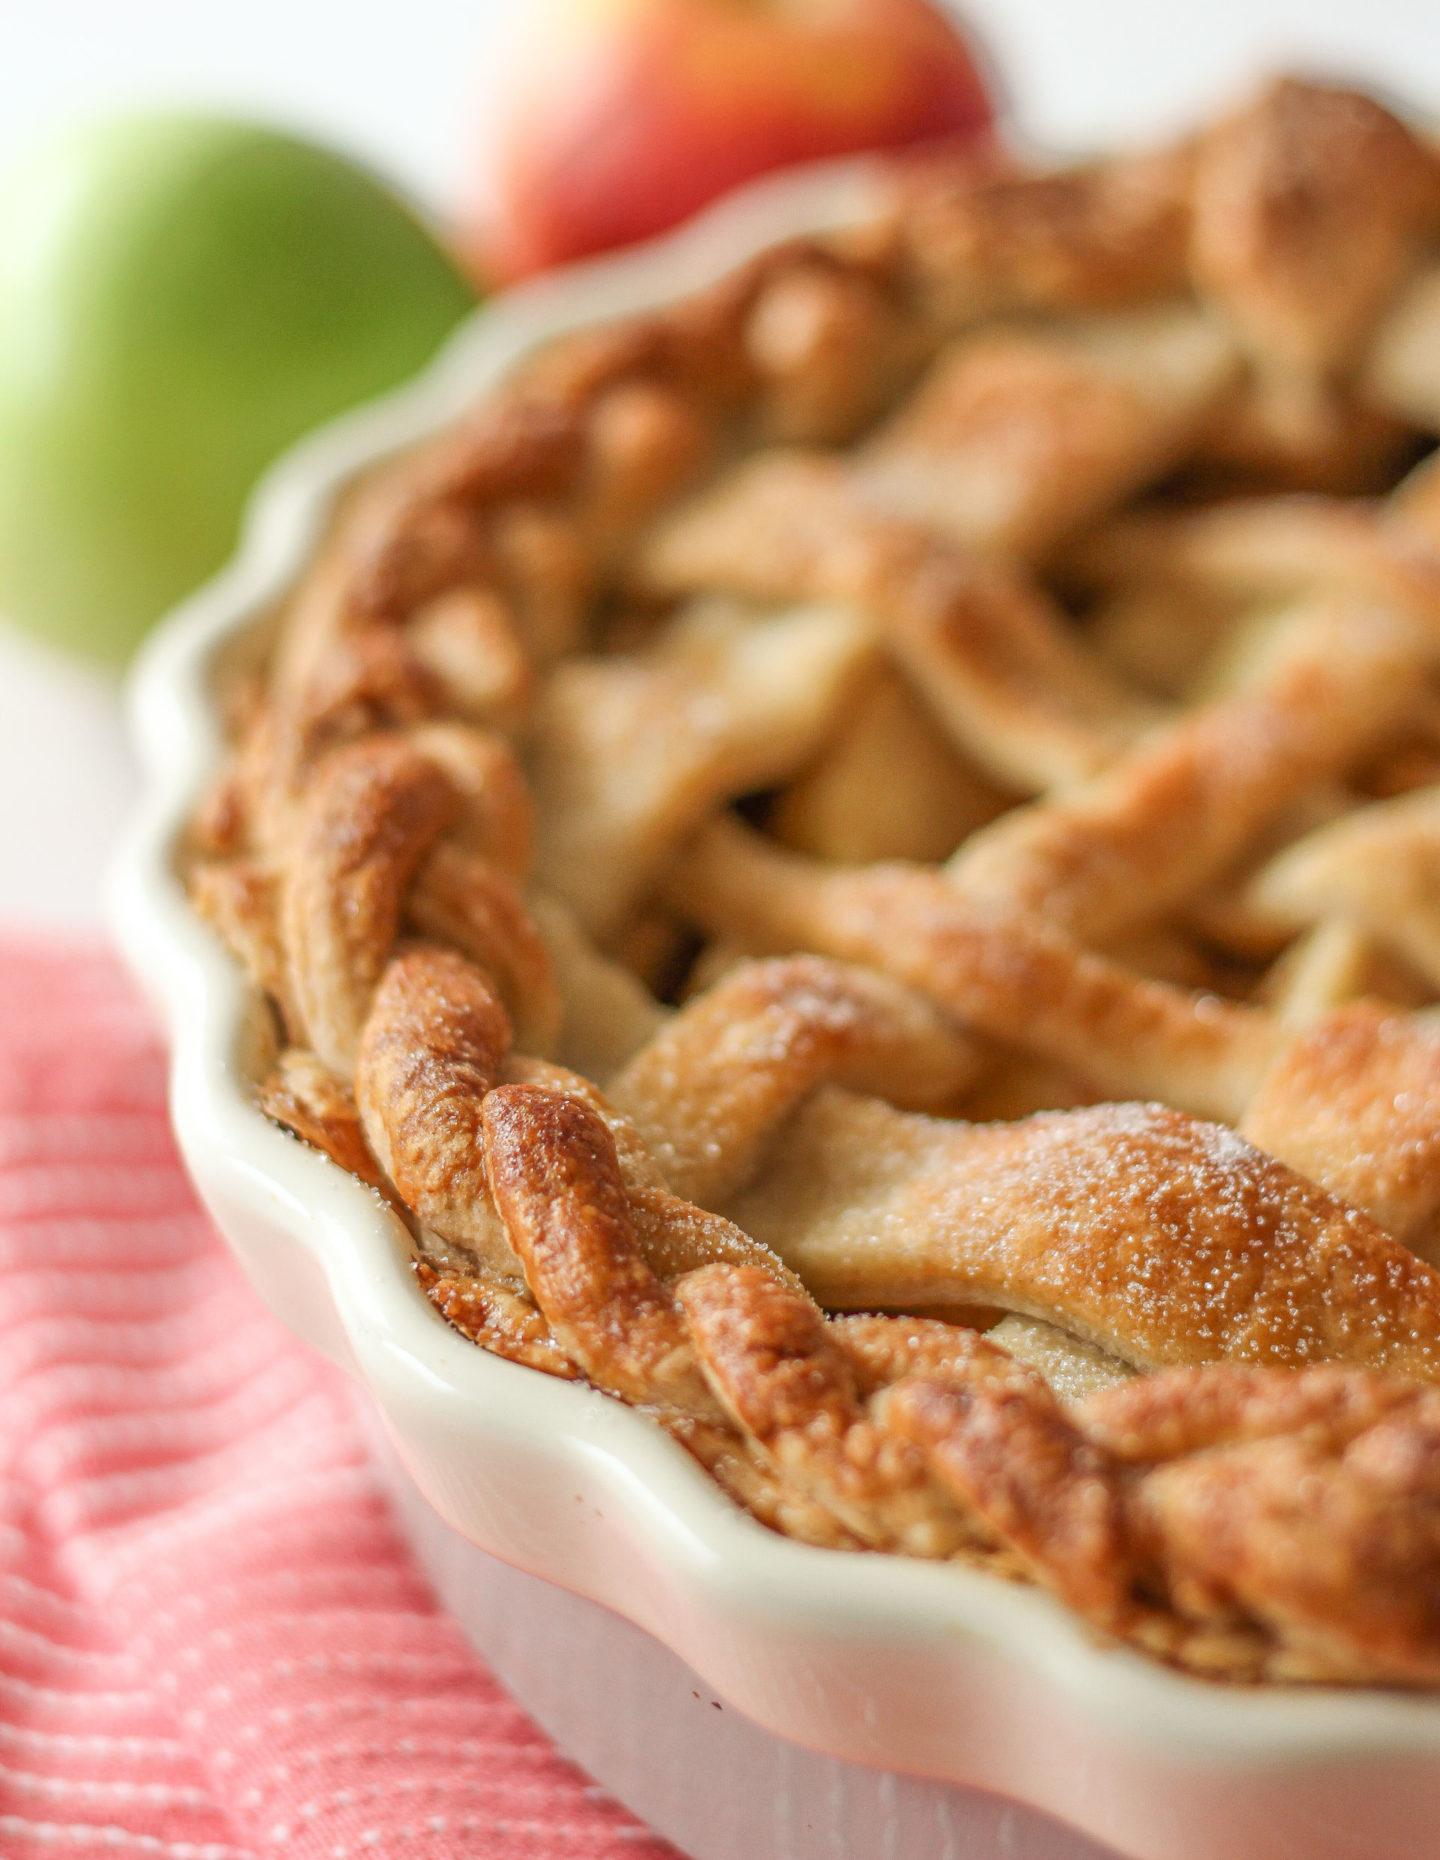 close up of unsliced lattice apple pie, focussed on the plaited crust